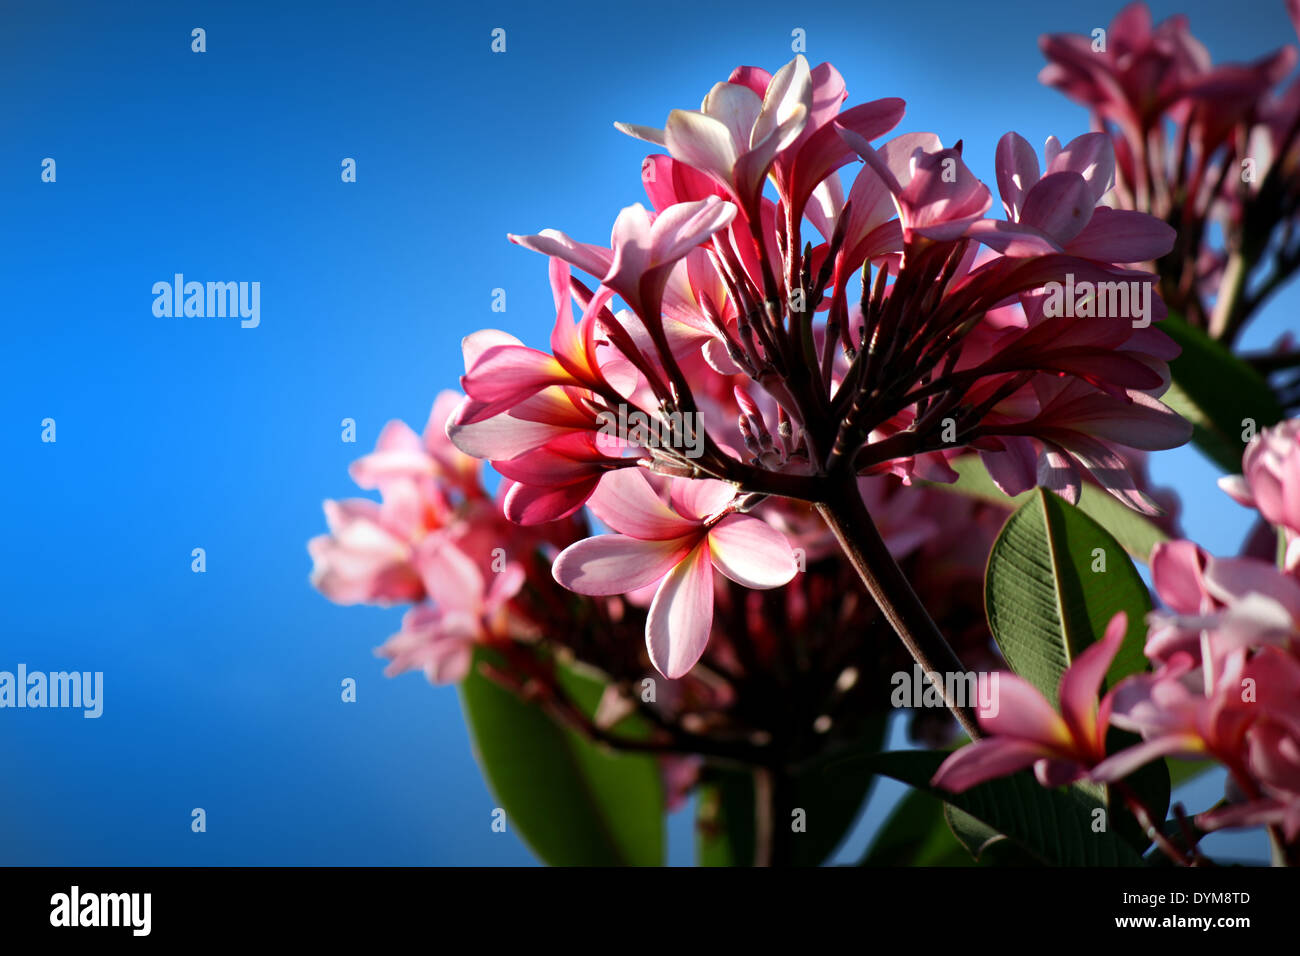 Frangipani Flower - Stock Image